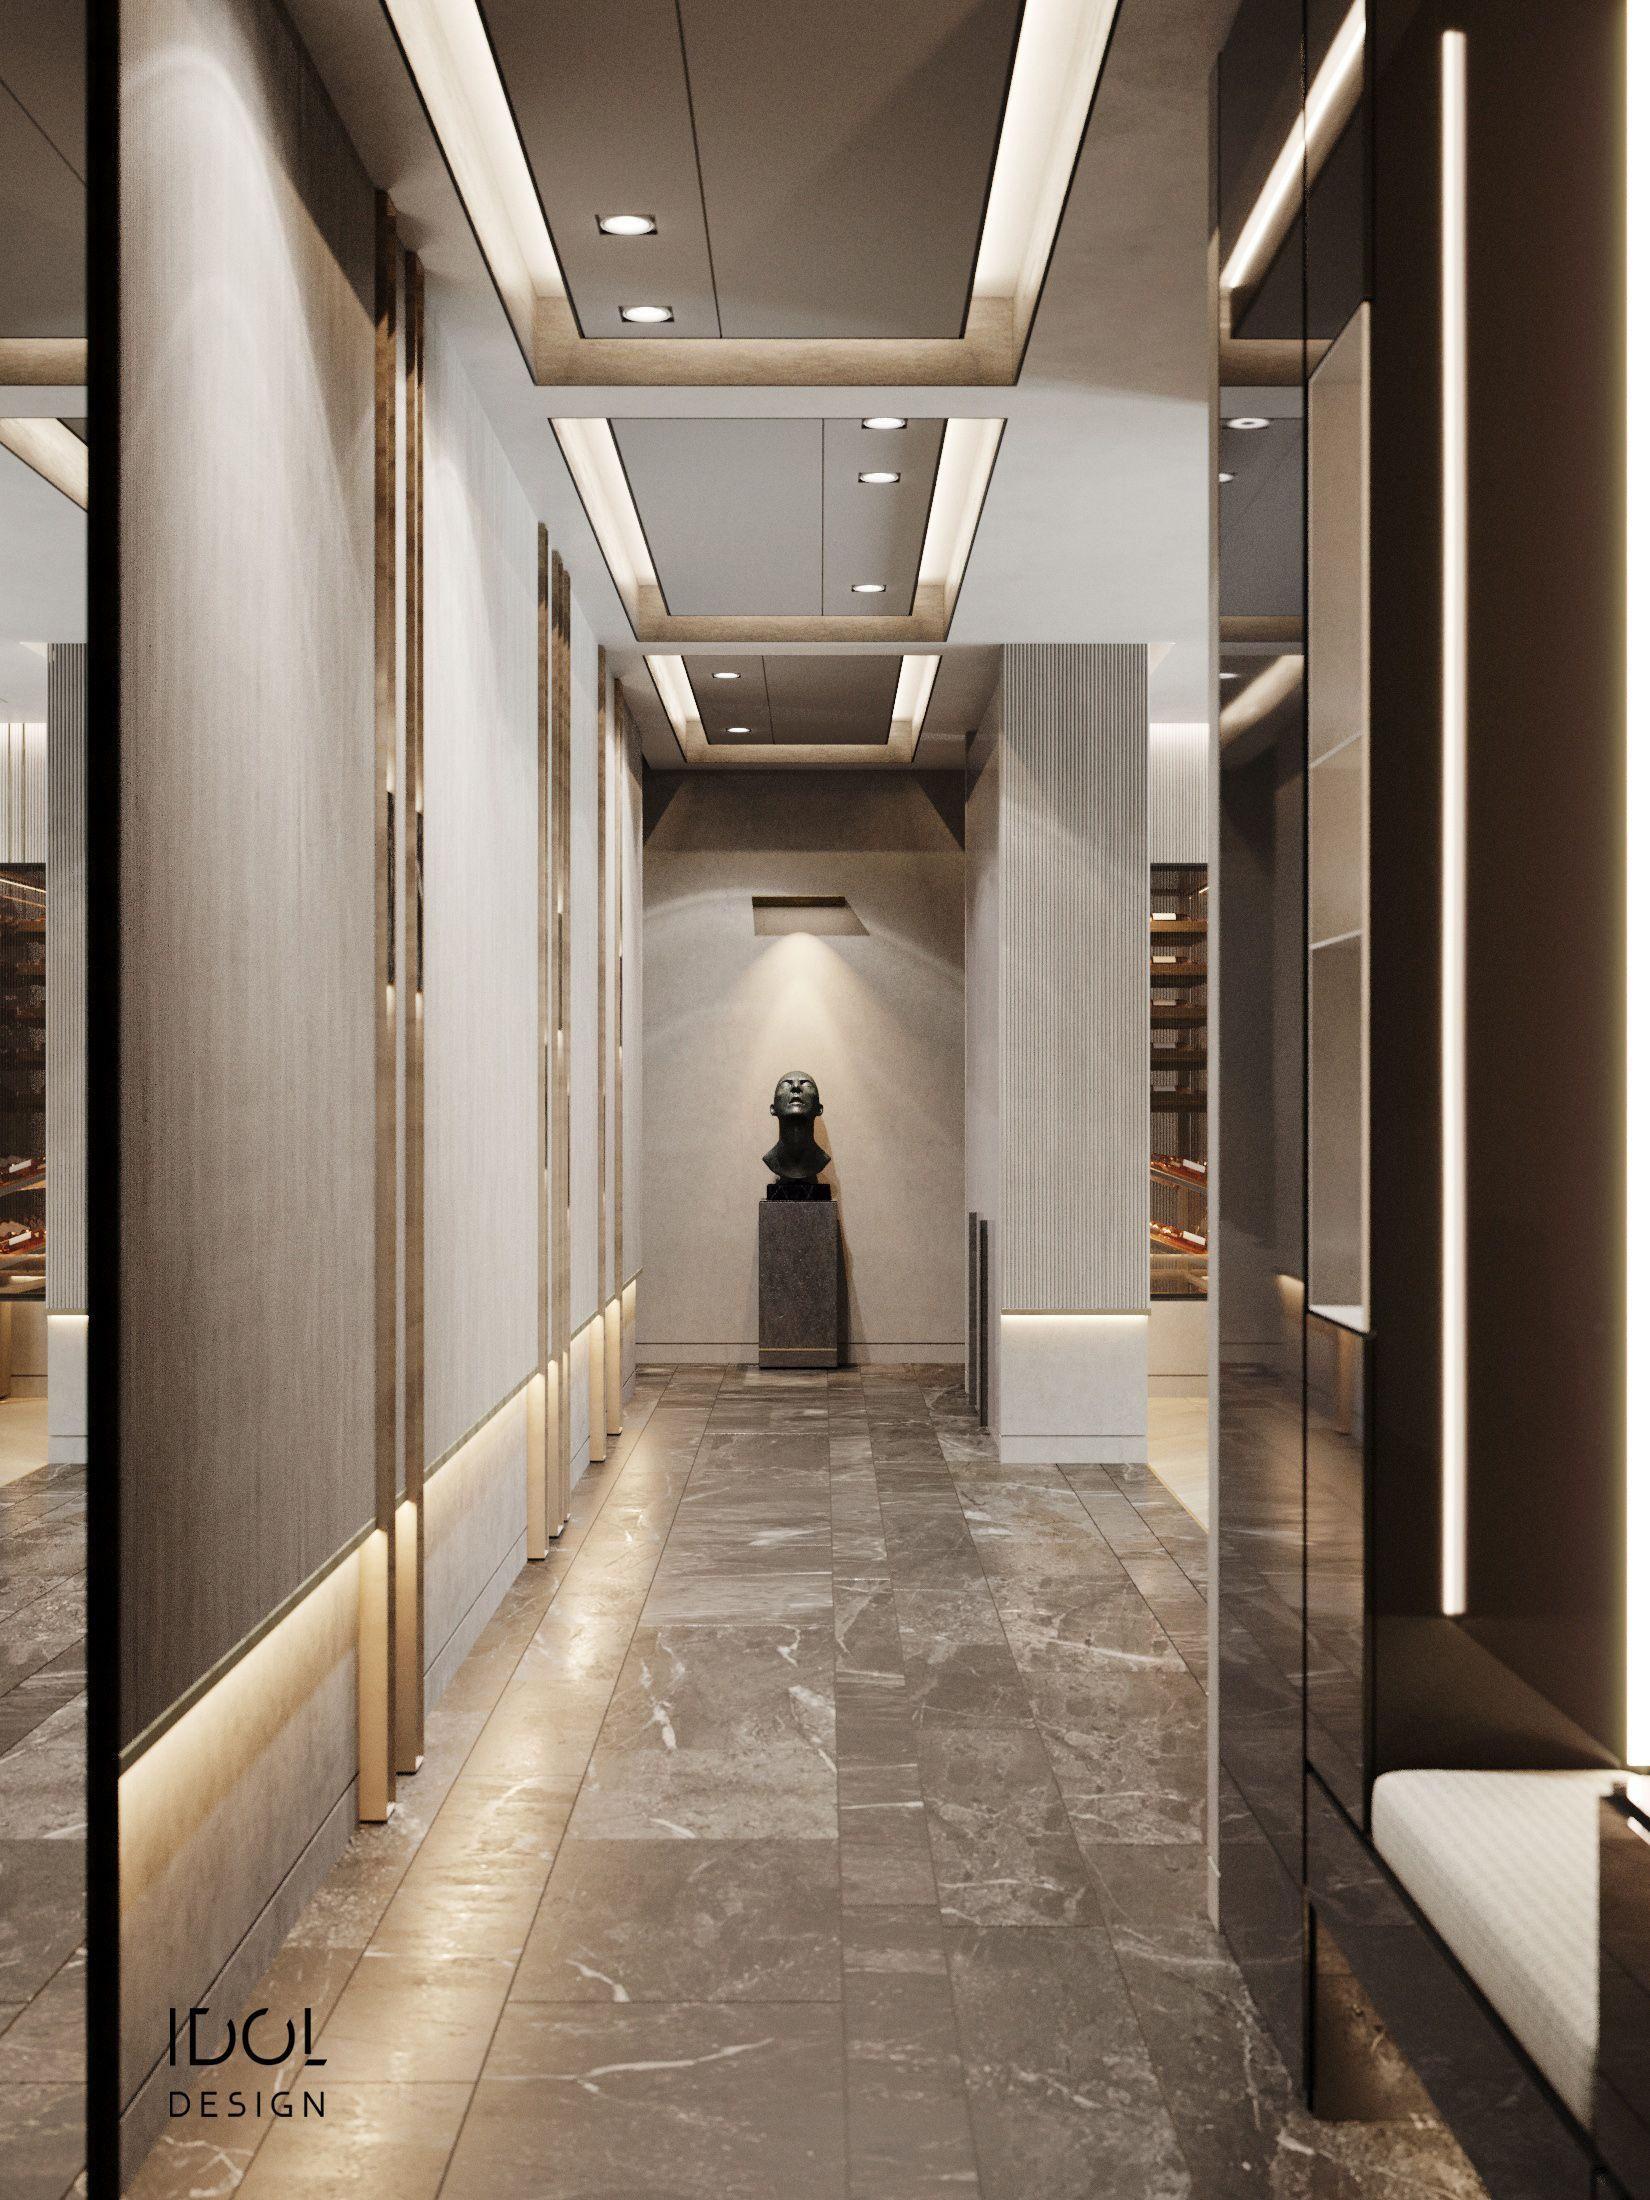 luxury modern hallway. Krestovskiy de luxe.  Hallway designs